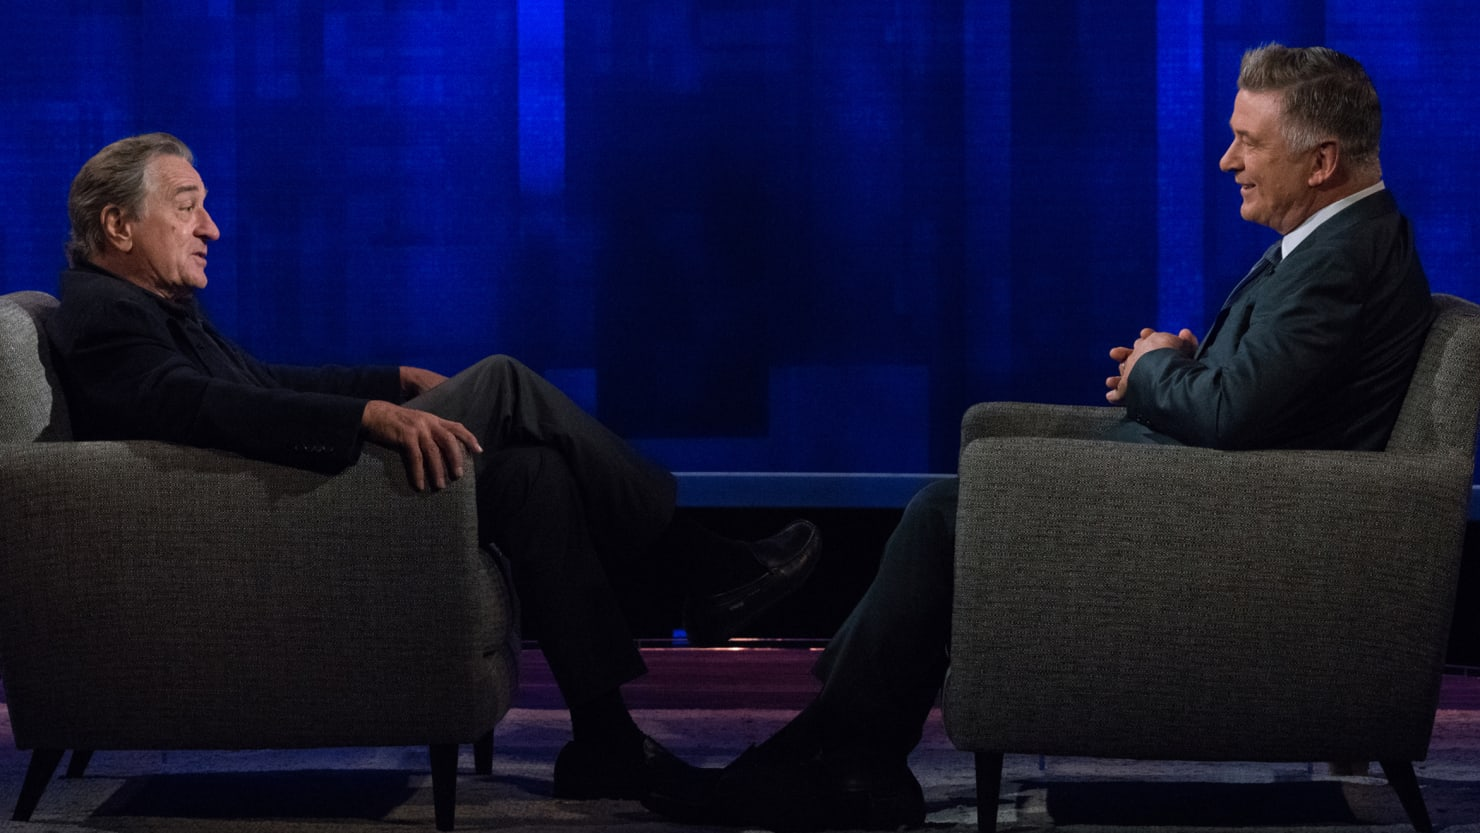 Robert De Niro to Alec Baldwin: Republicans Backing Trump Are 'Making a Deal With the Devil'